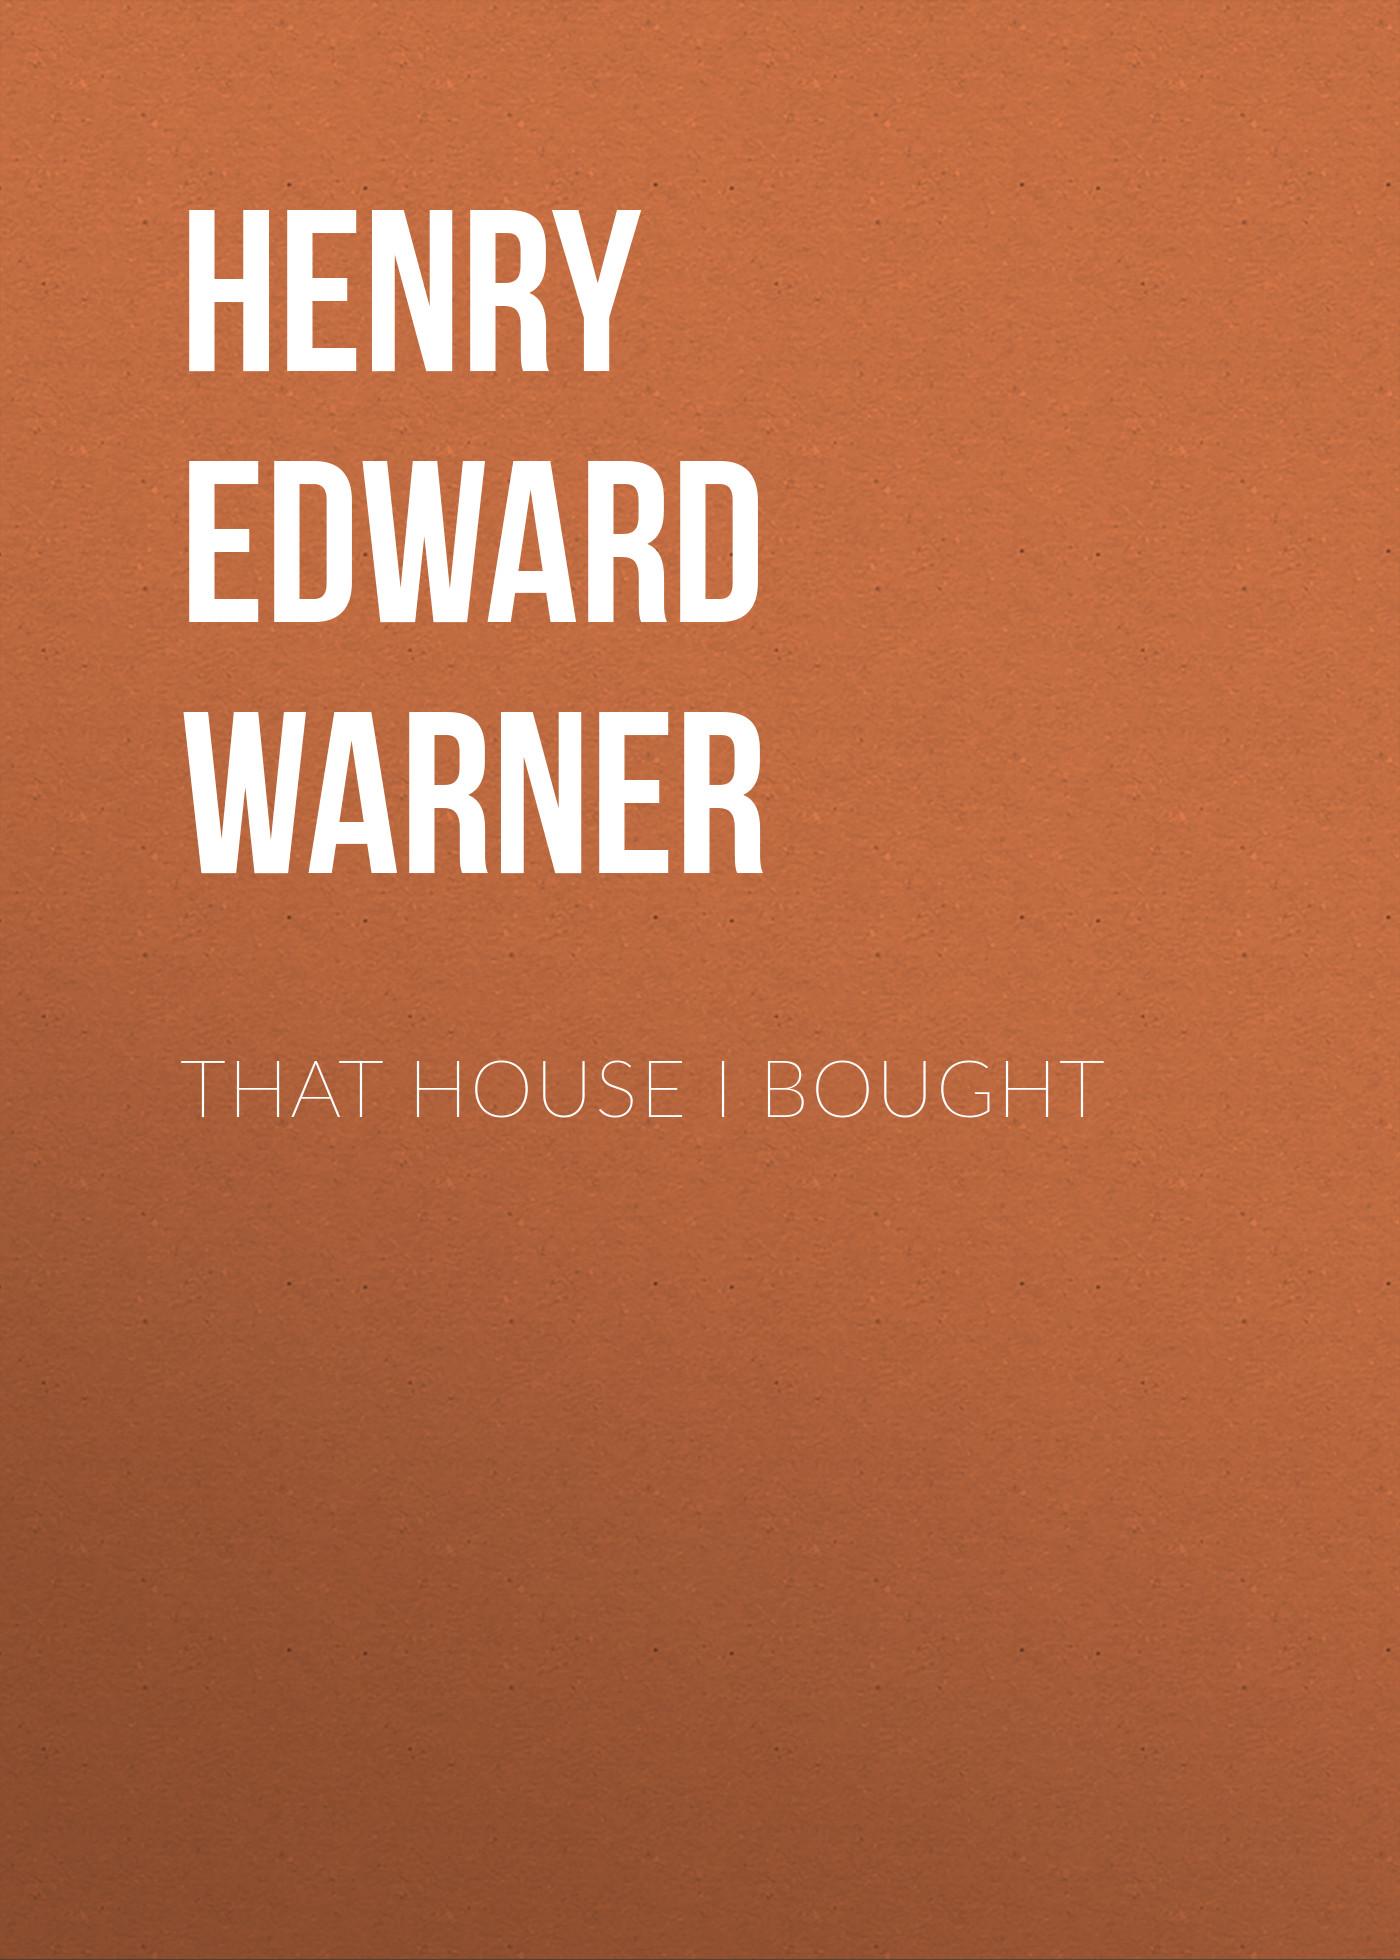 цена на Henry Edward Warner That House I Bought